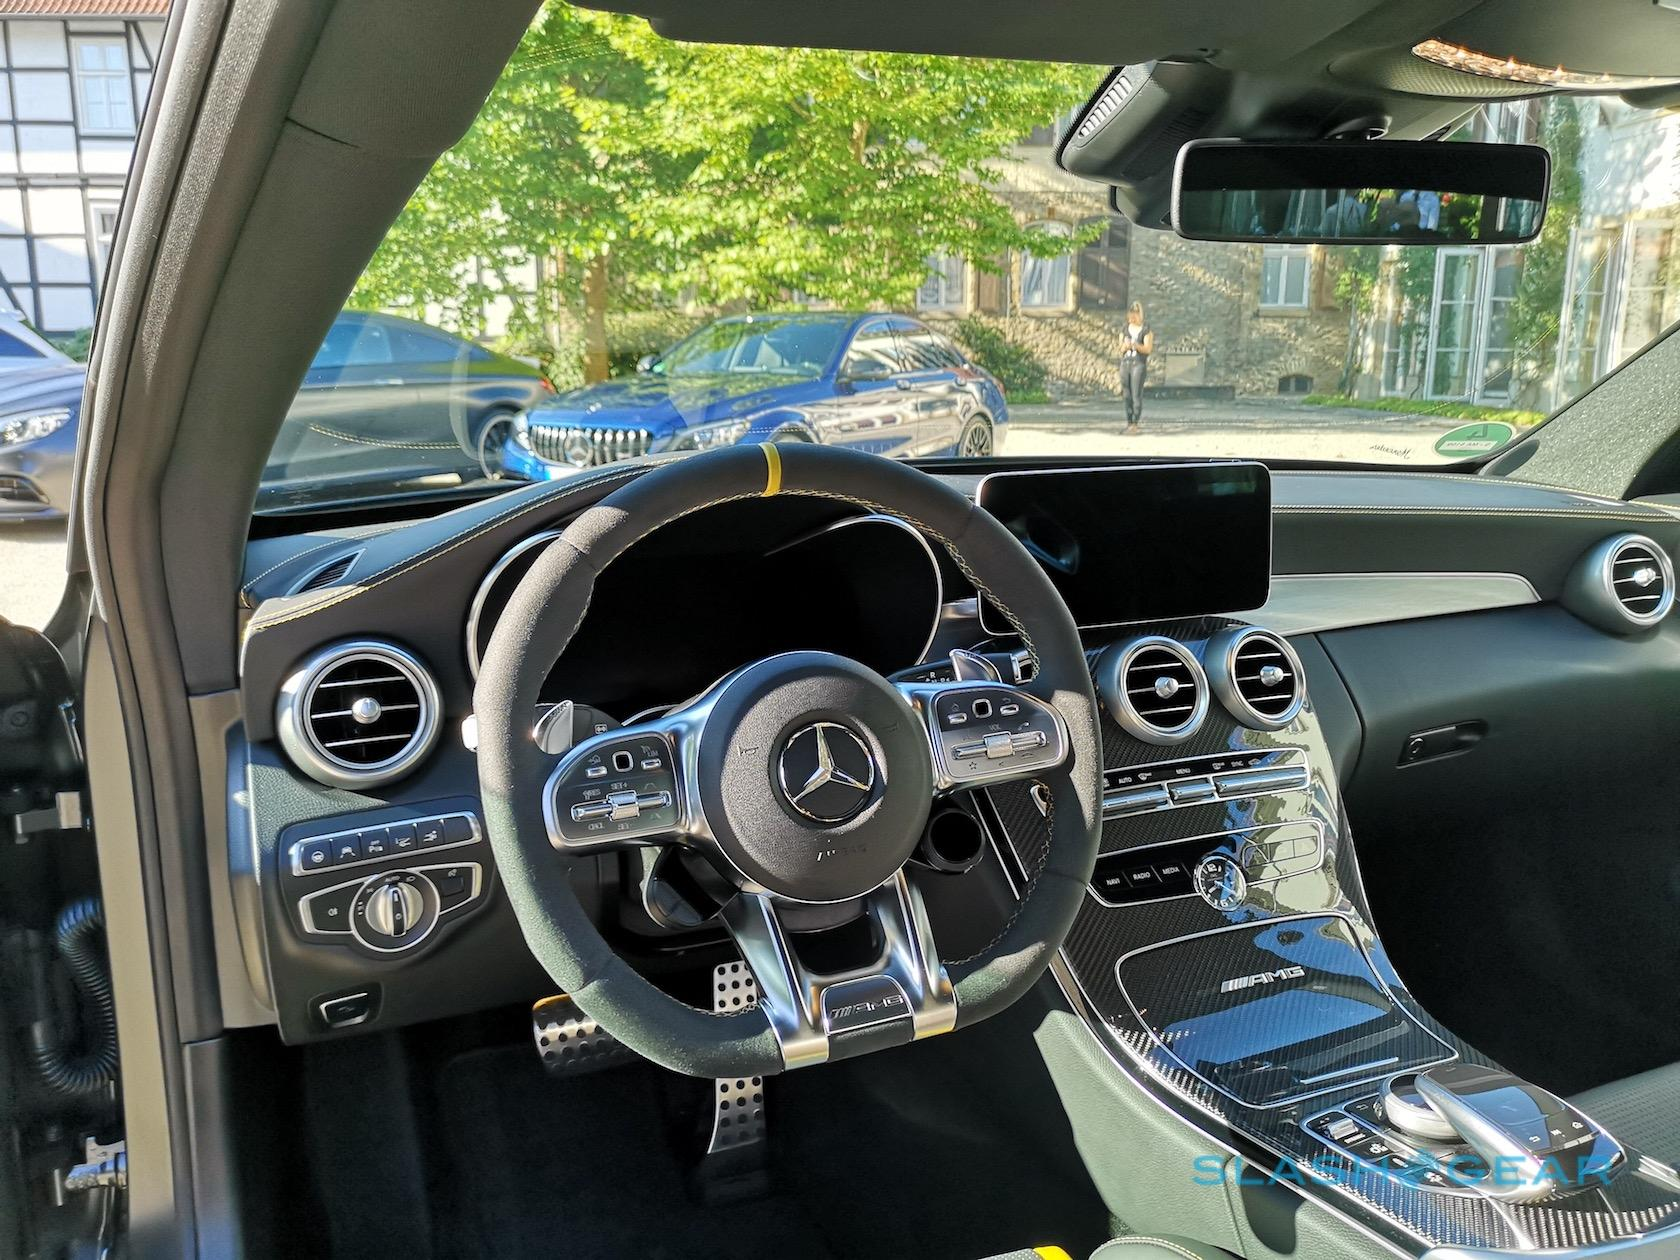 2019 Mercedes-AMG C63 S and C63 Gallery - SlashGear